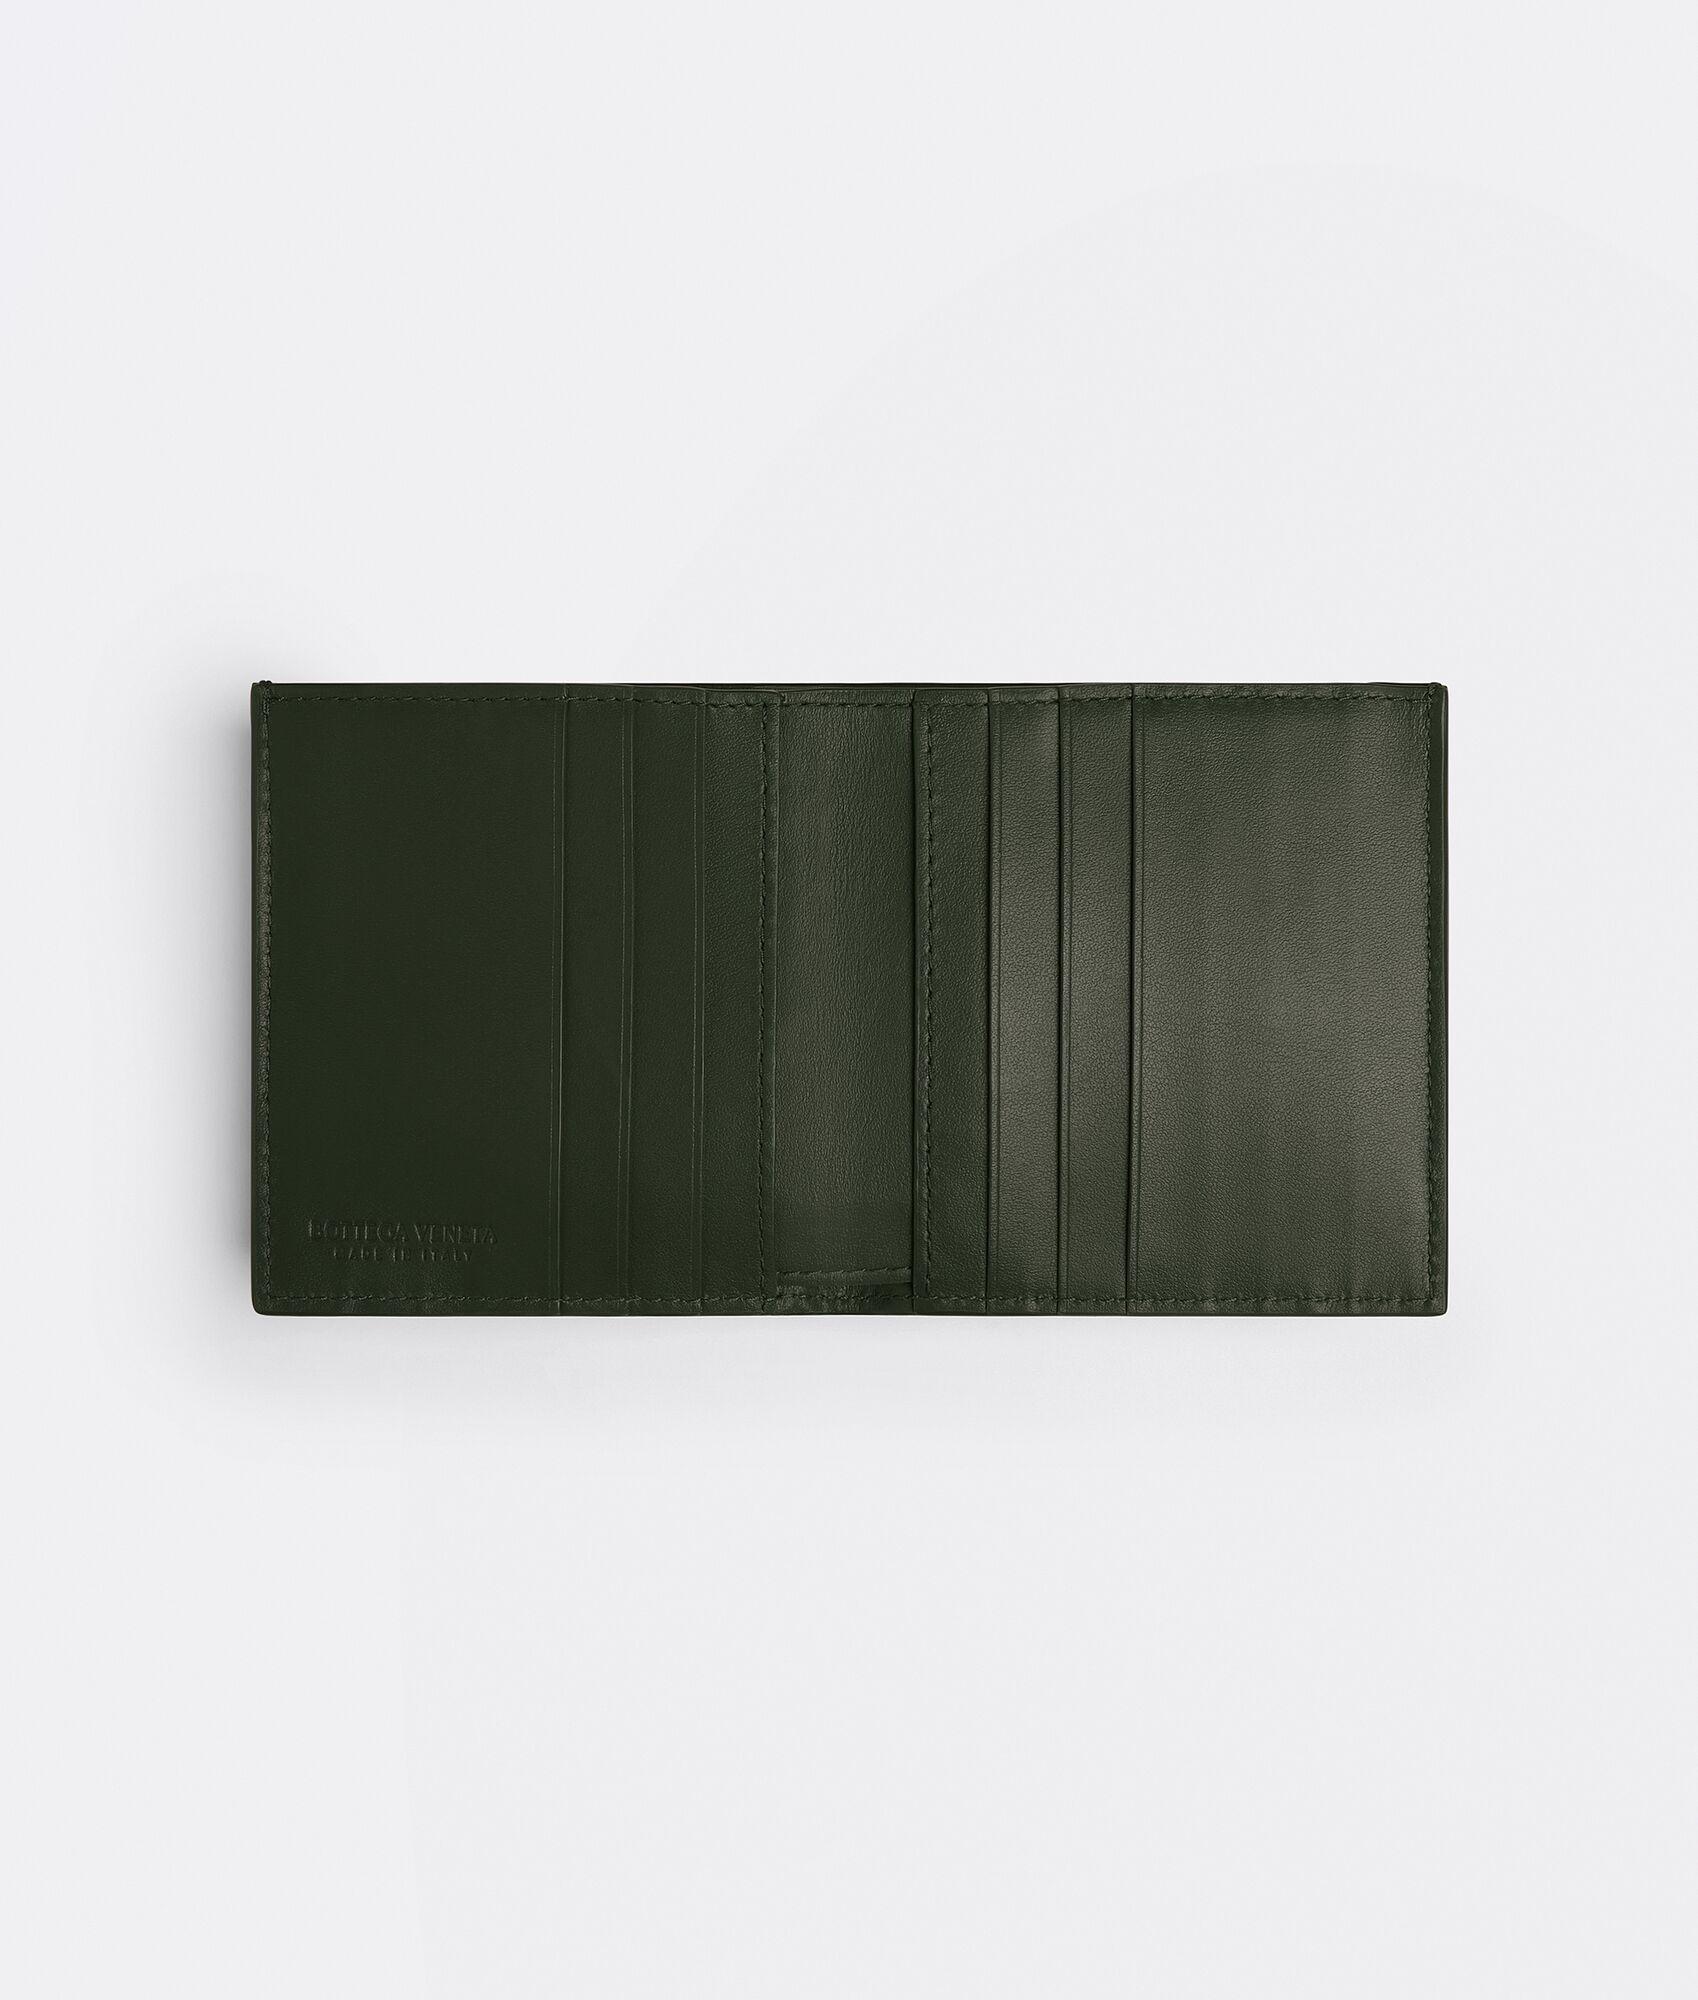 BOTTEGA VENETA ミニ財布 の内装画像